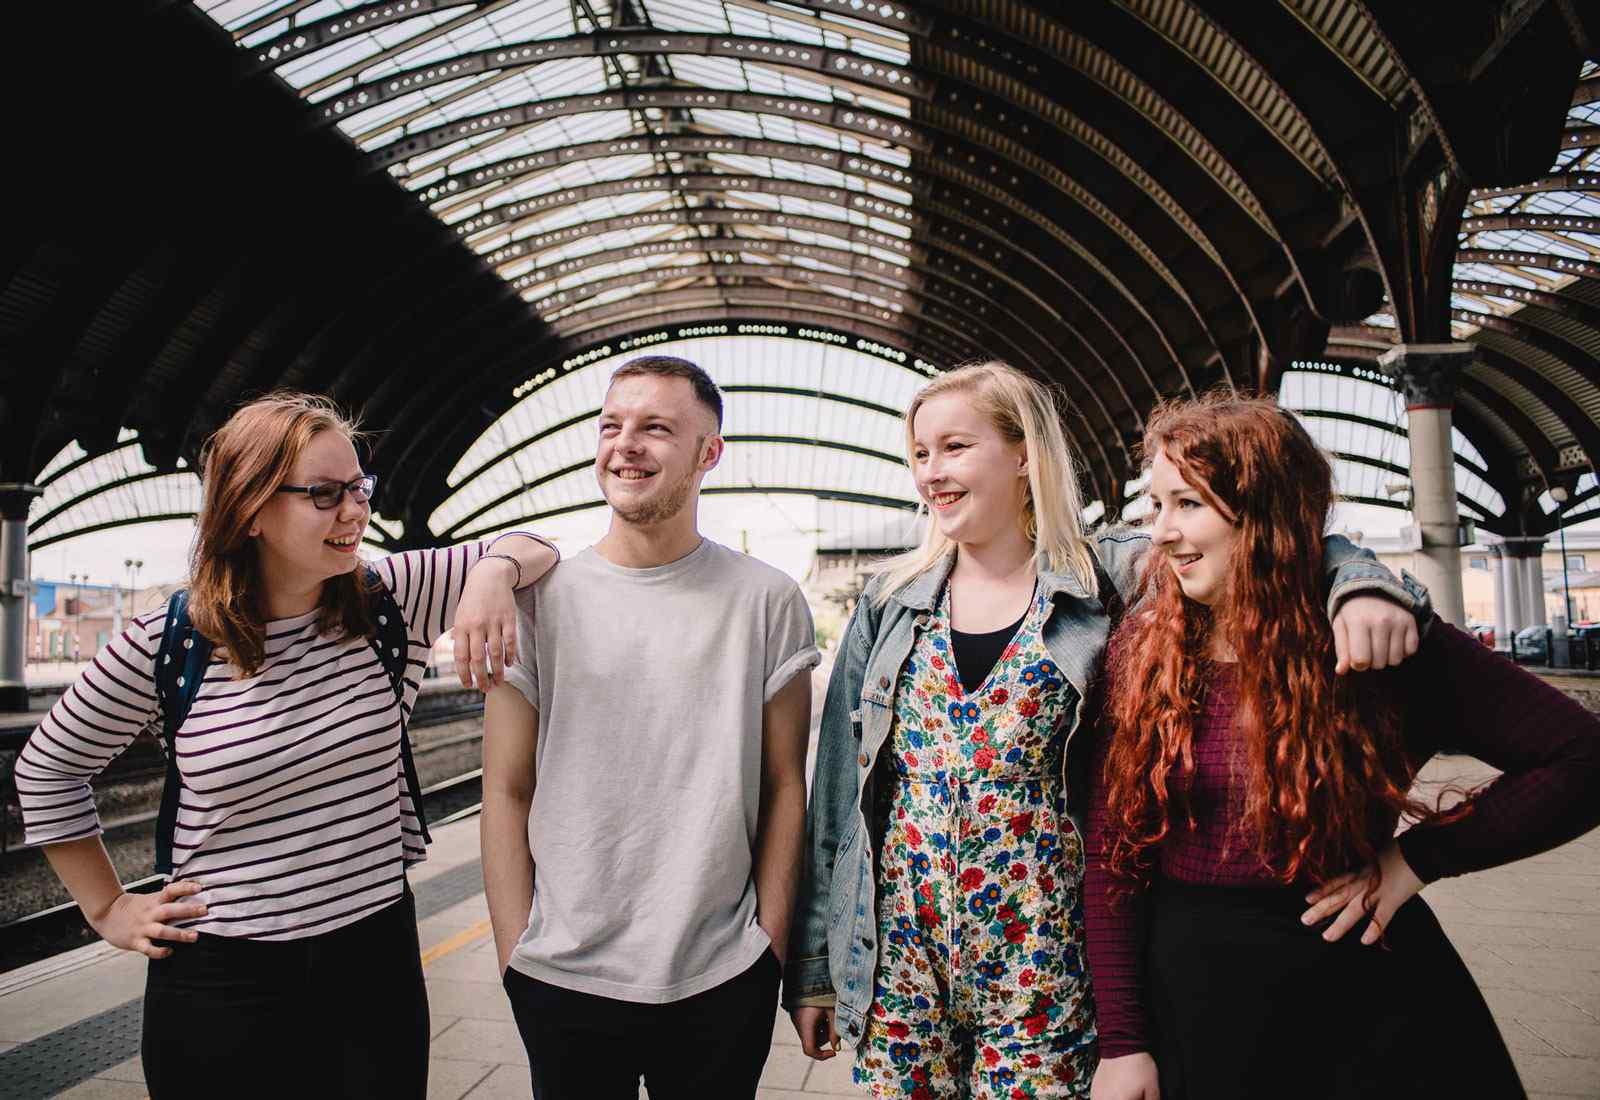 Happy students at York train station